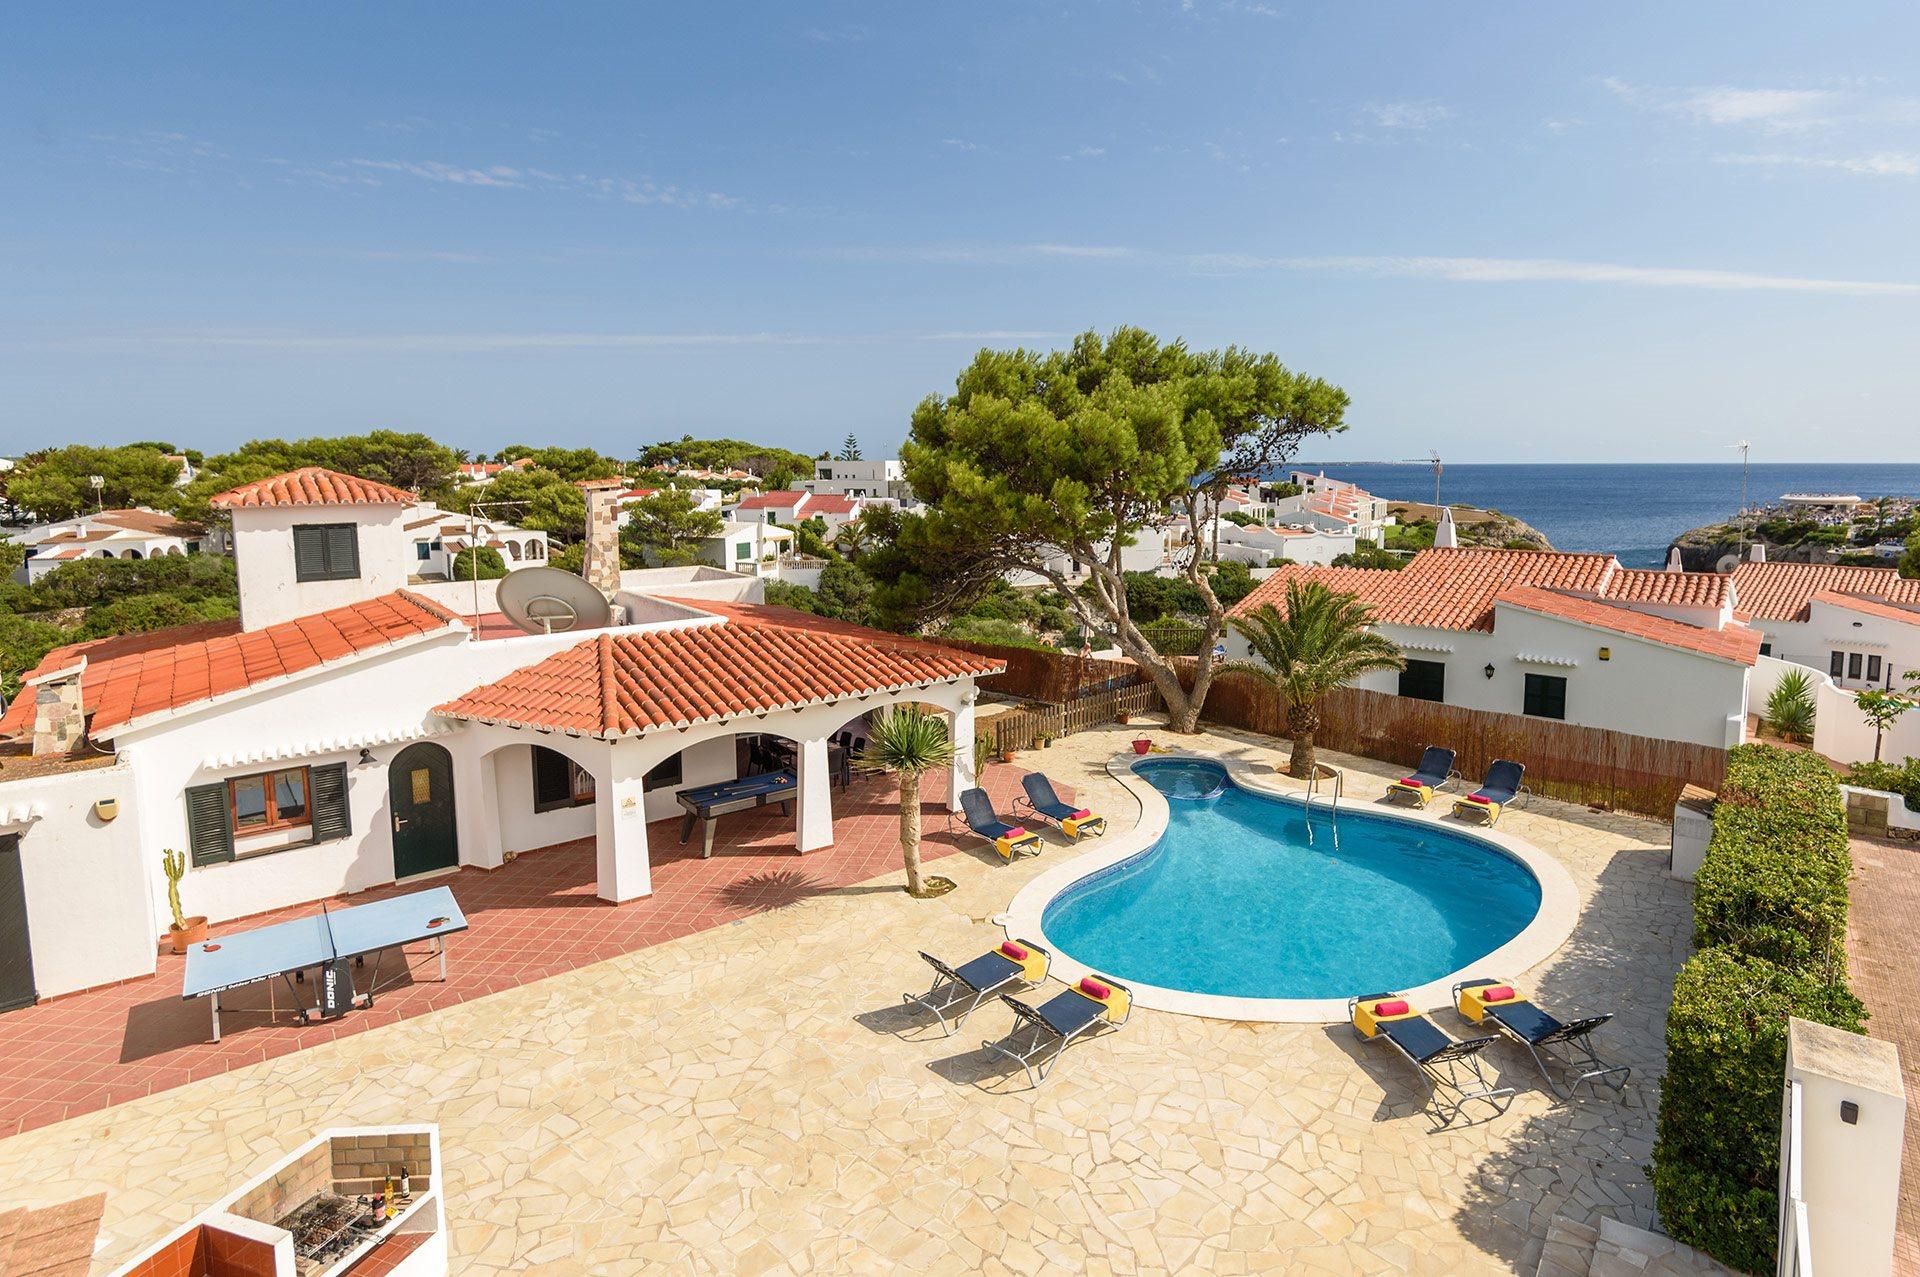 Villa Nuriana, Calan Forcat, Menorca, Spain